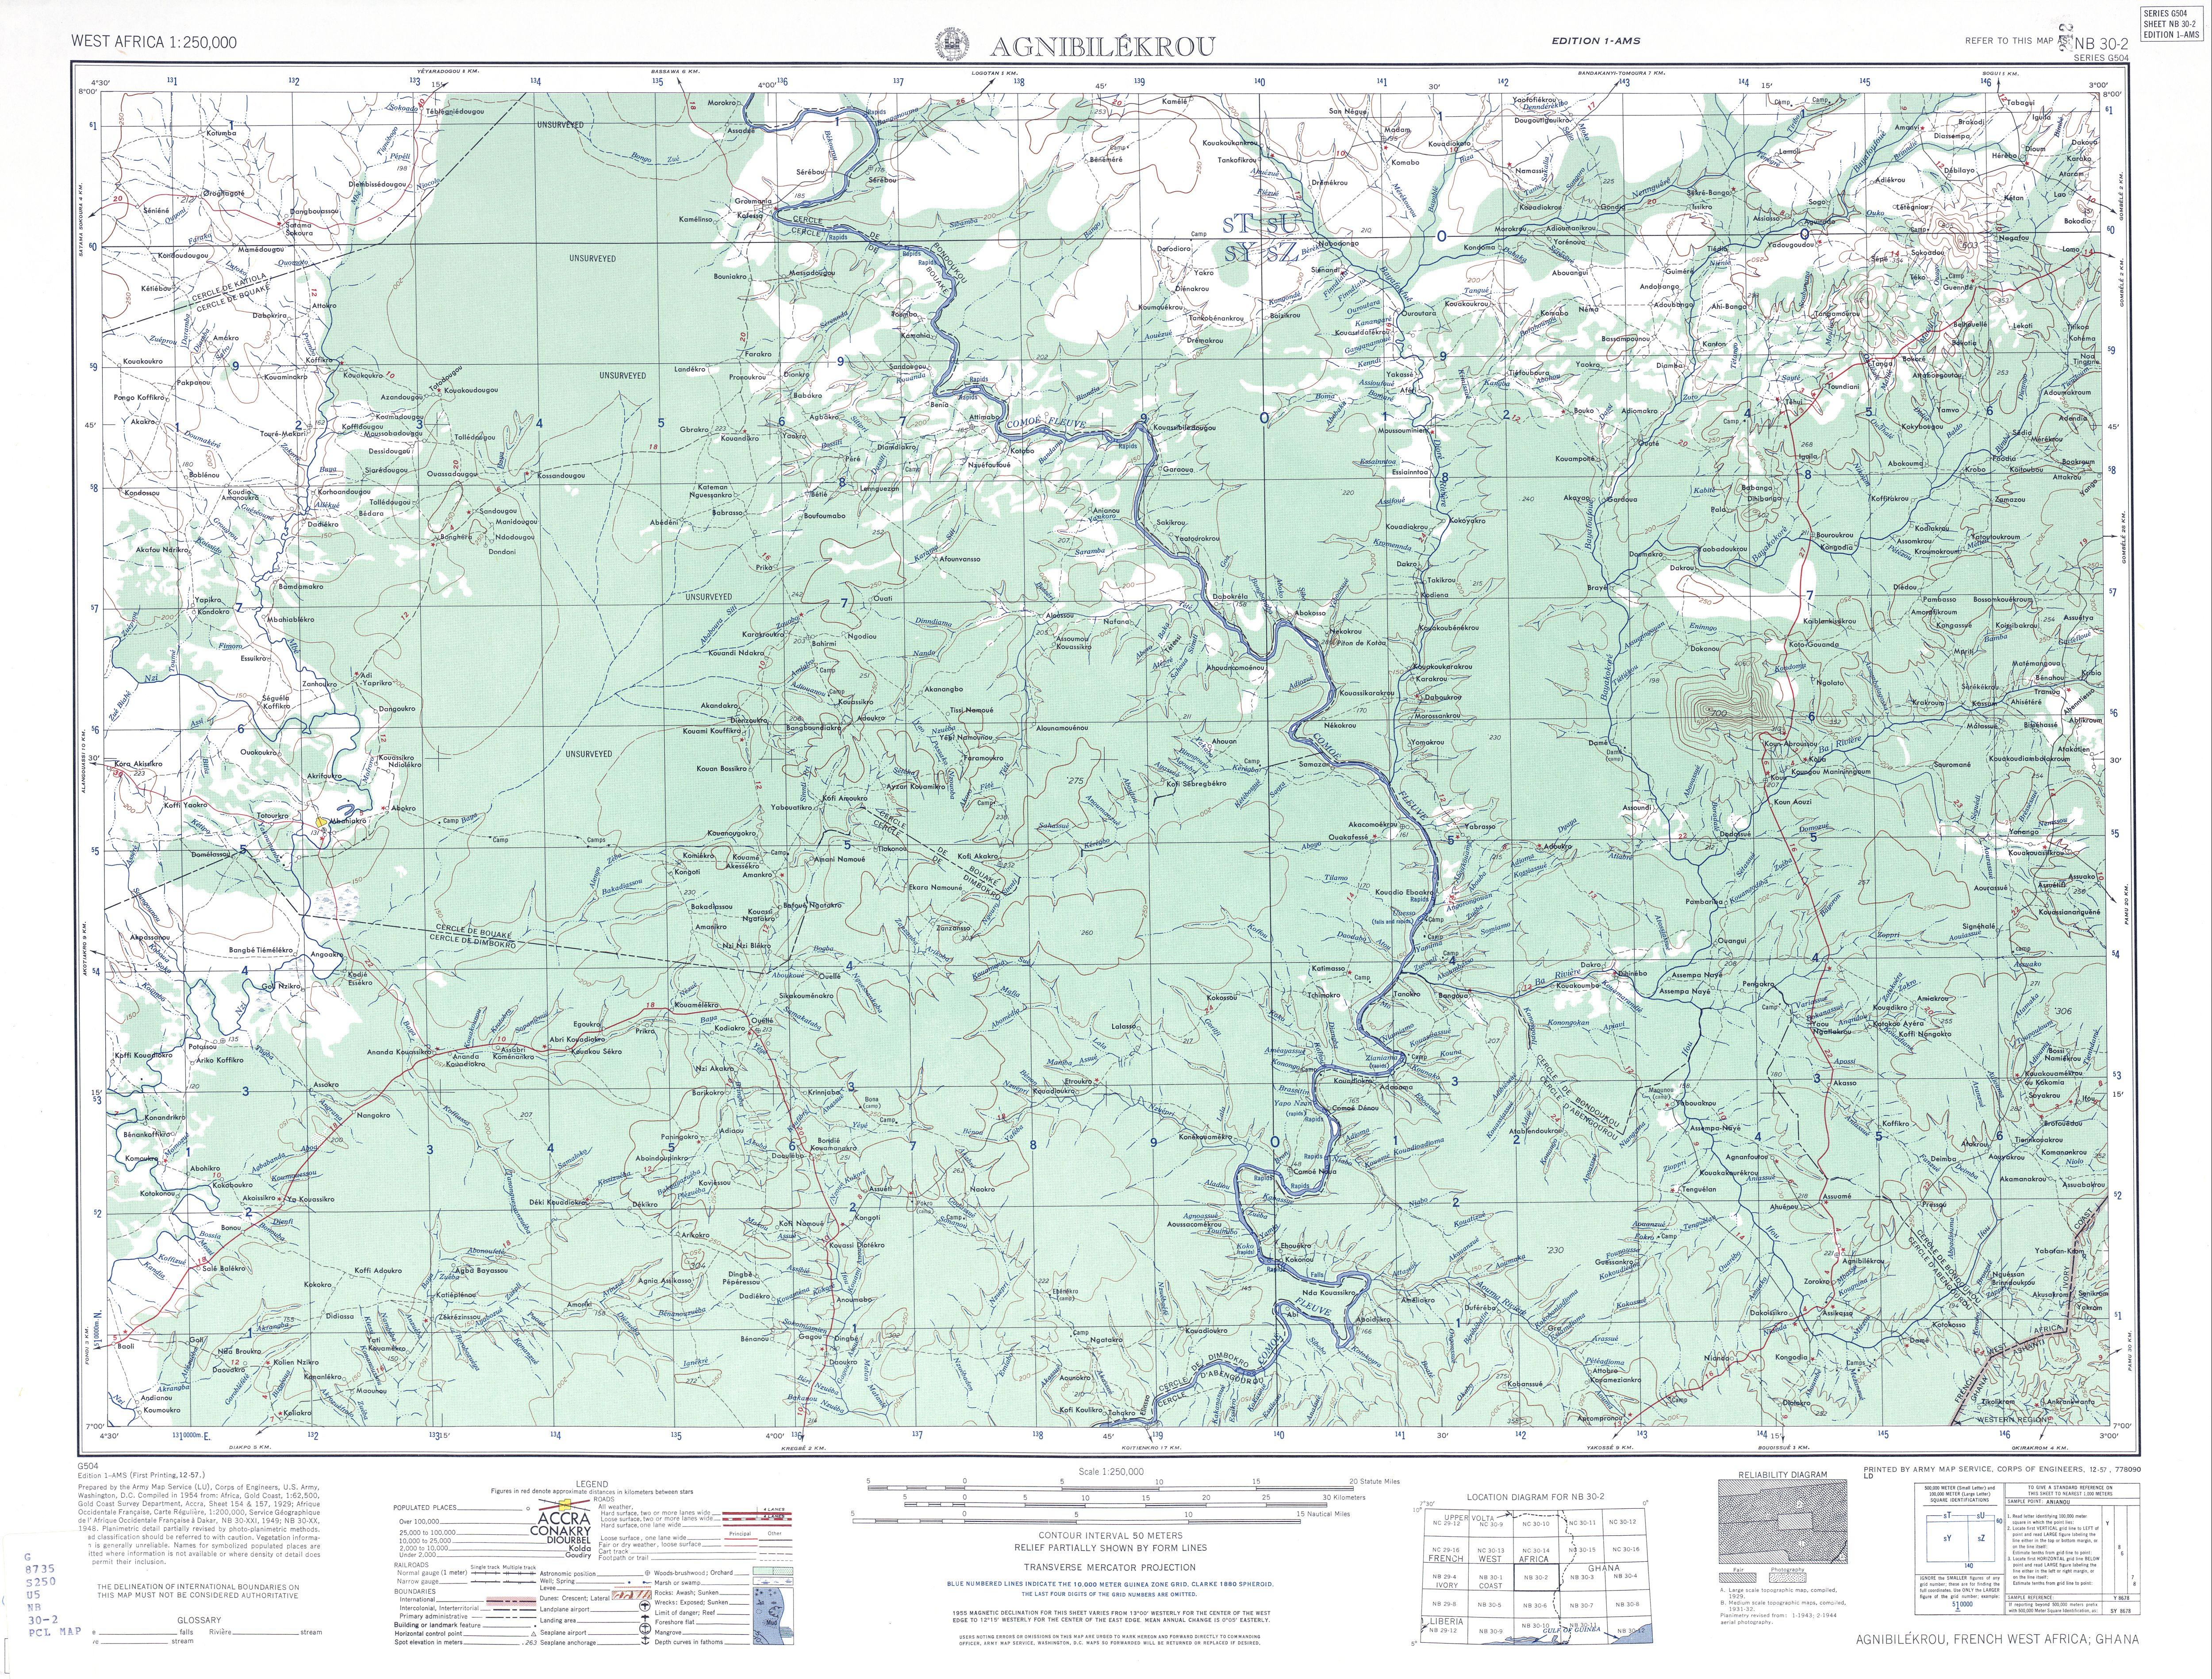 Agnibilekrou Topographic Map Sheet, Western Africa 1955